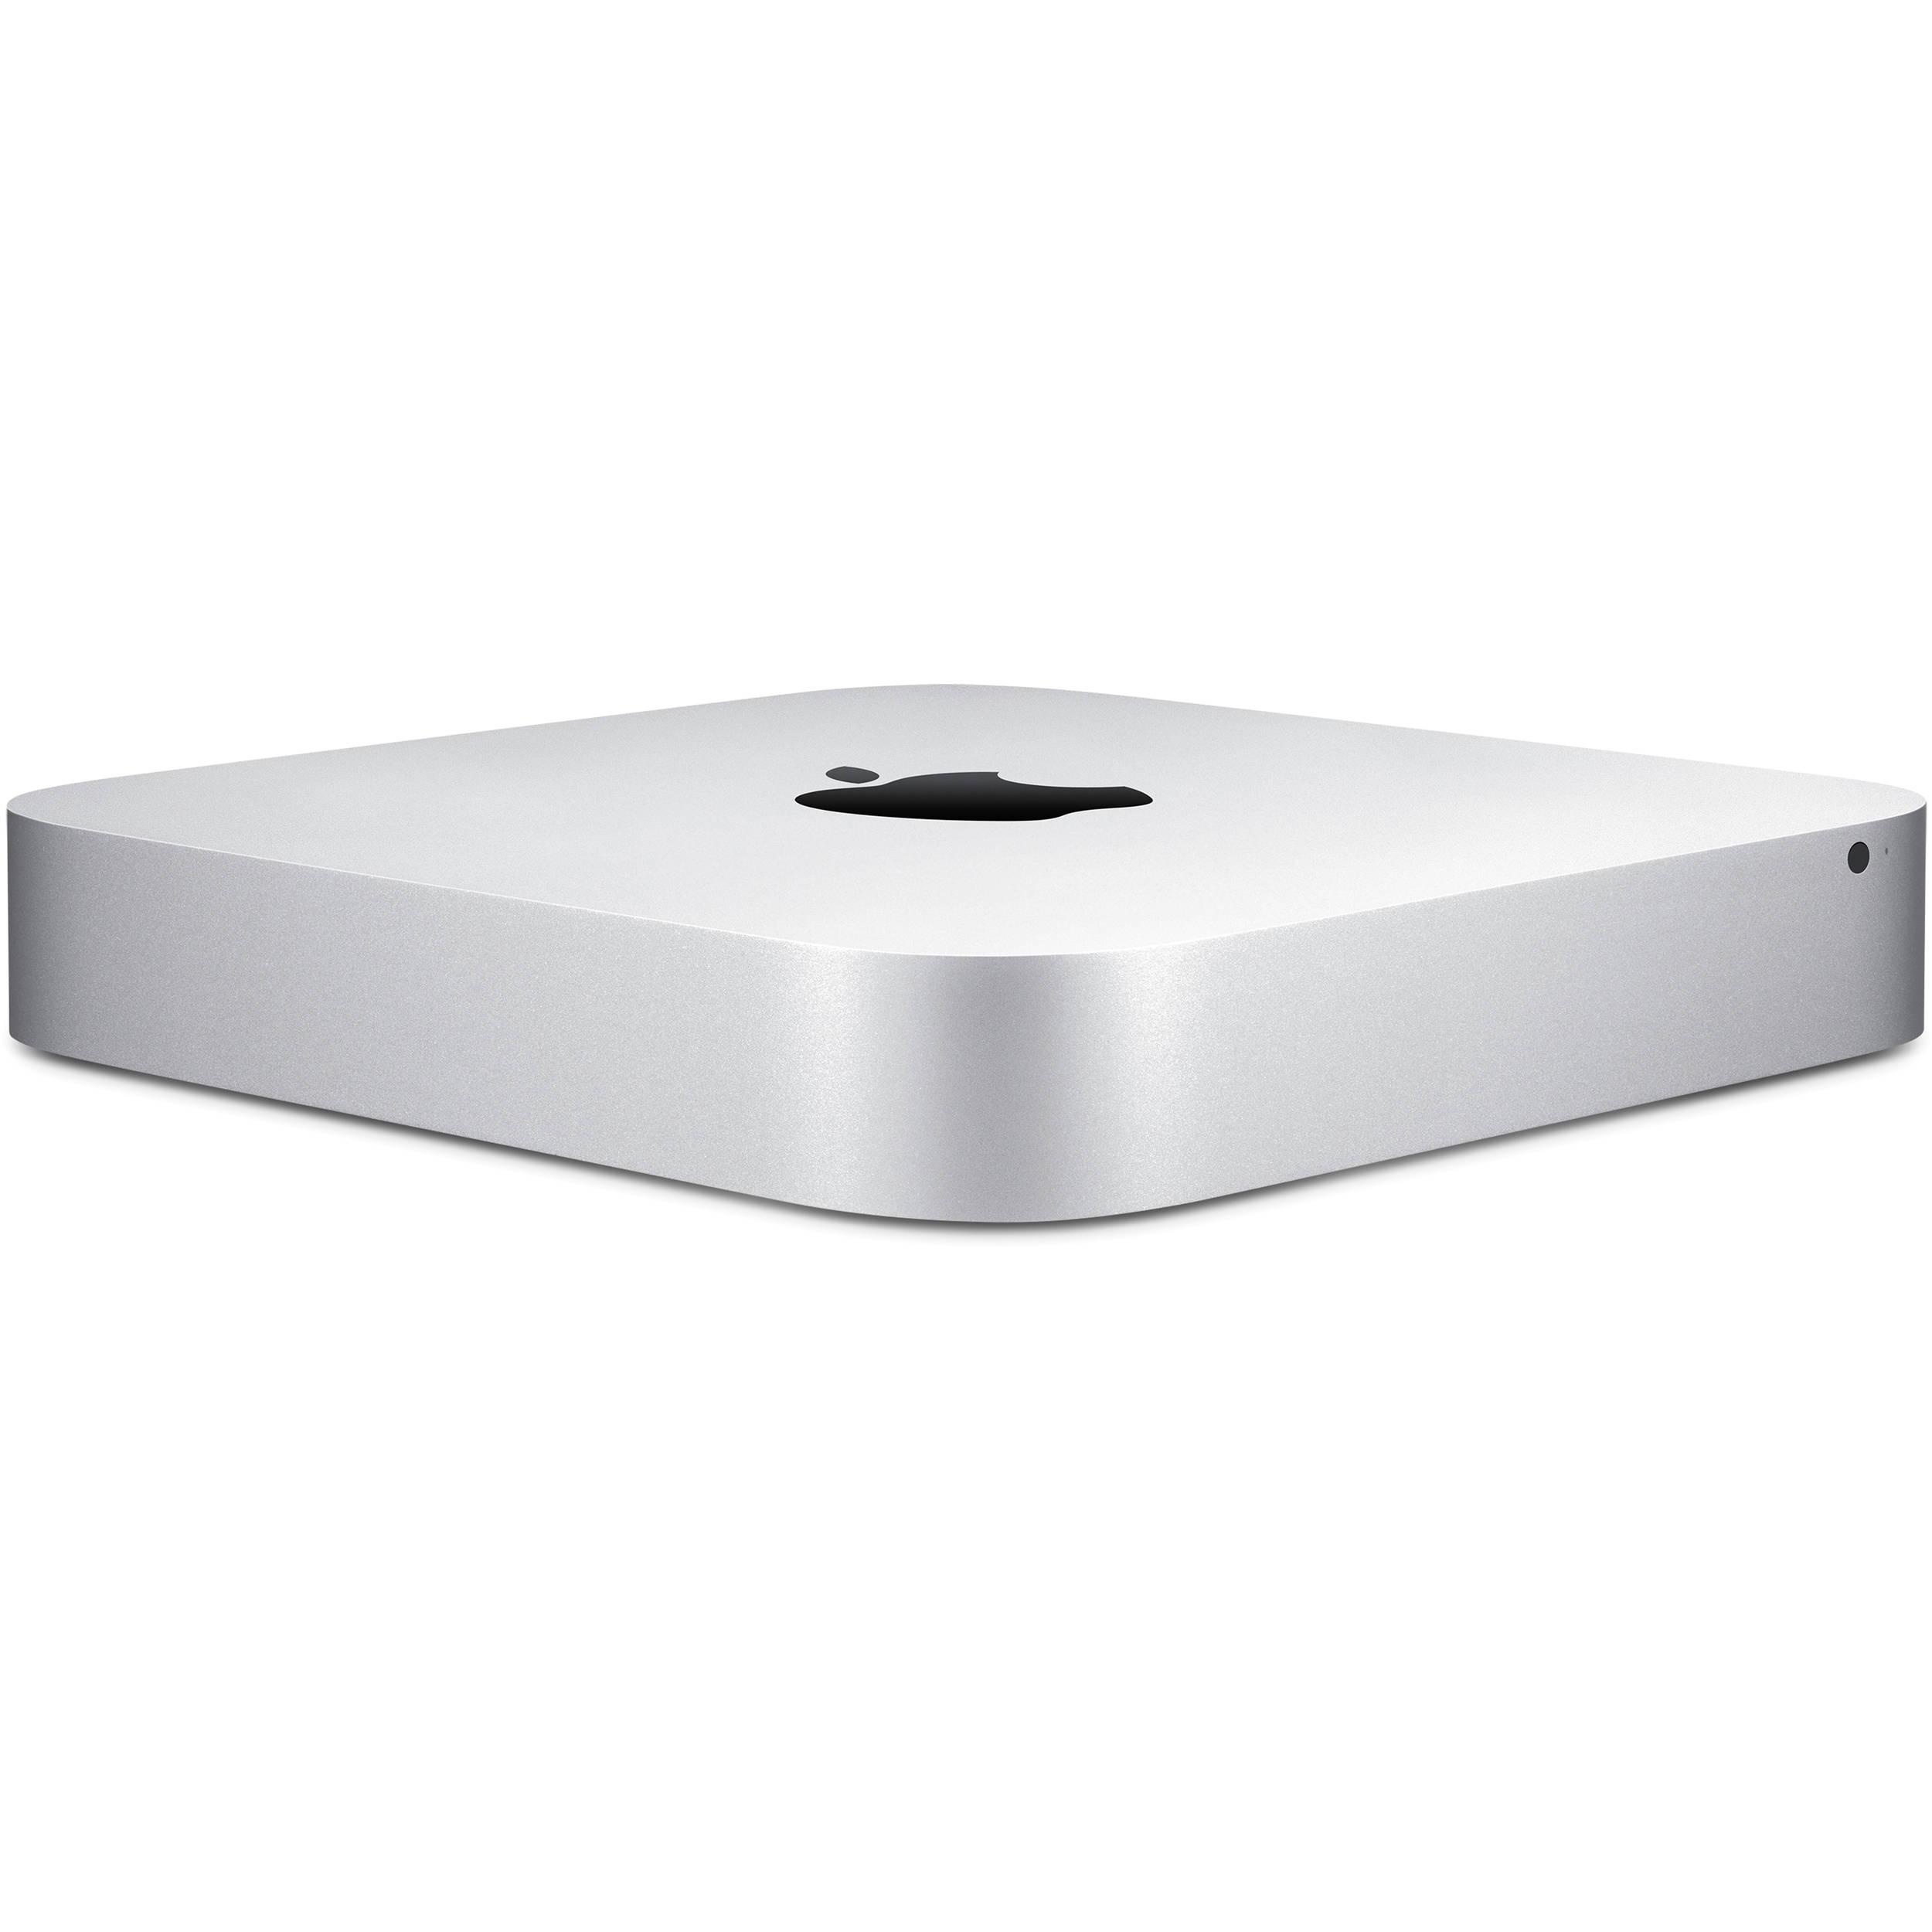 Apple Mac Mini 26 Ghz Desktop Computer Late 2014 Z0r7 Mgen25 Click Image For Larger Versionnameimg1634jpgviews268size638 Kbid